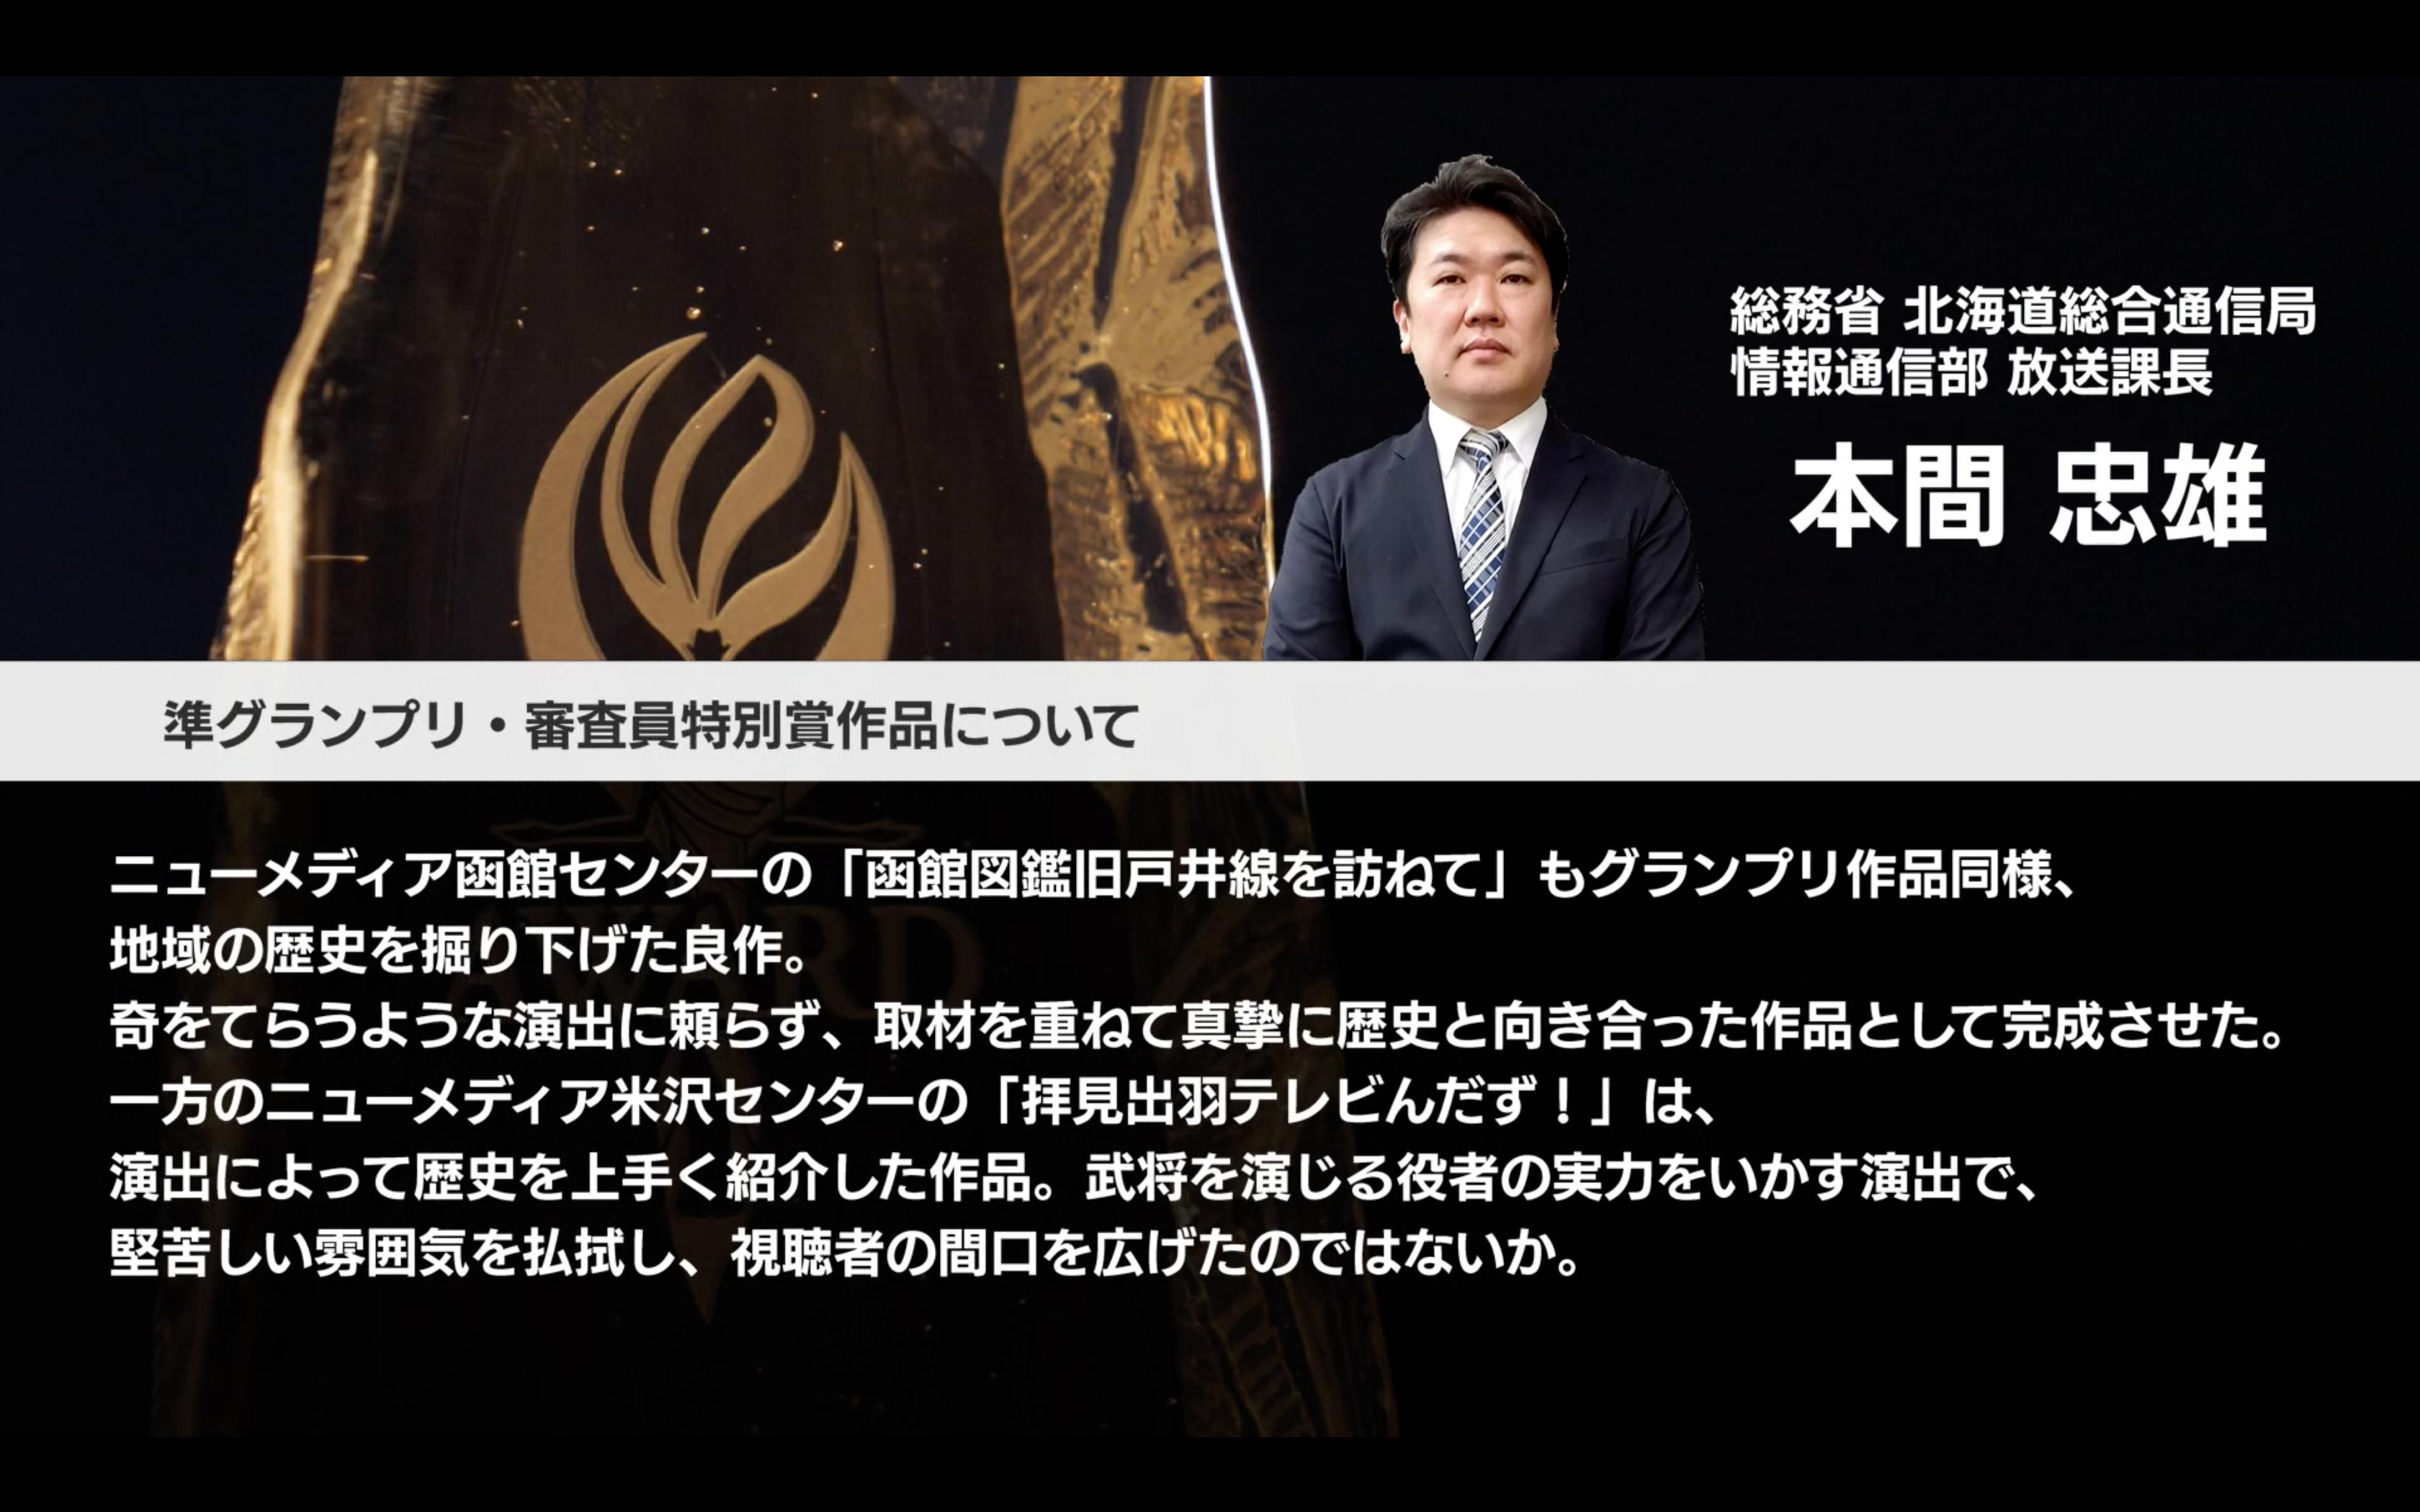 http://www.monokaki-0138.jp/hakodate/%E3%82%B9%E3%82%AF%E3%83%AA%E3%83%BC%E3%83%B3%E3%82%B7%E3%83%A7%E3%83%83%E3%83%88%202021-03-25%2015.59.39.png